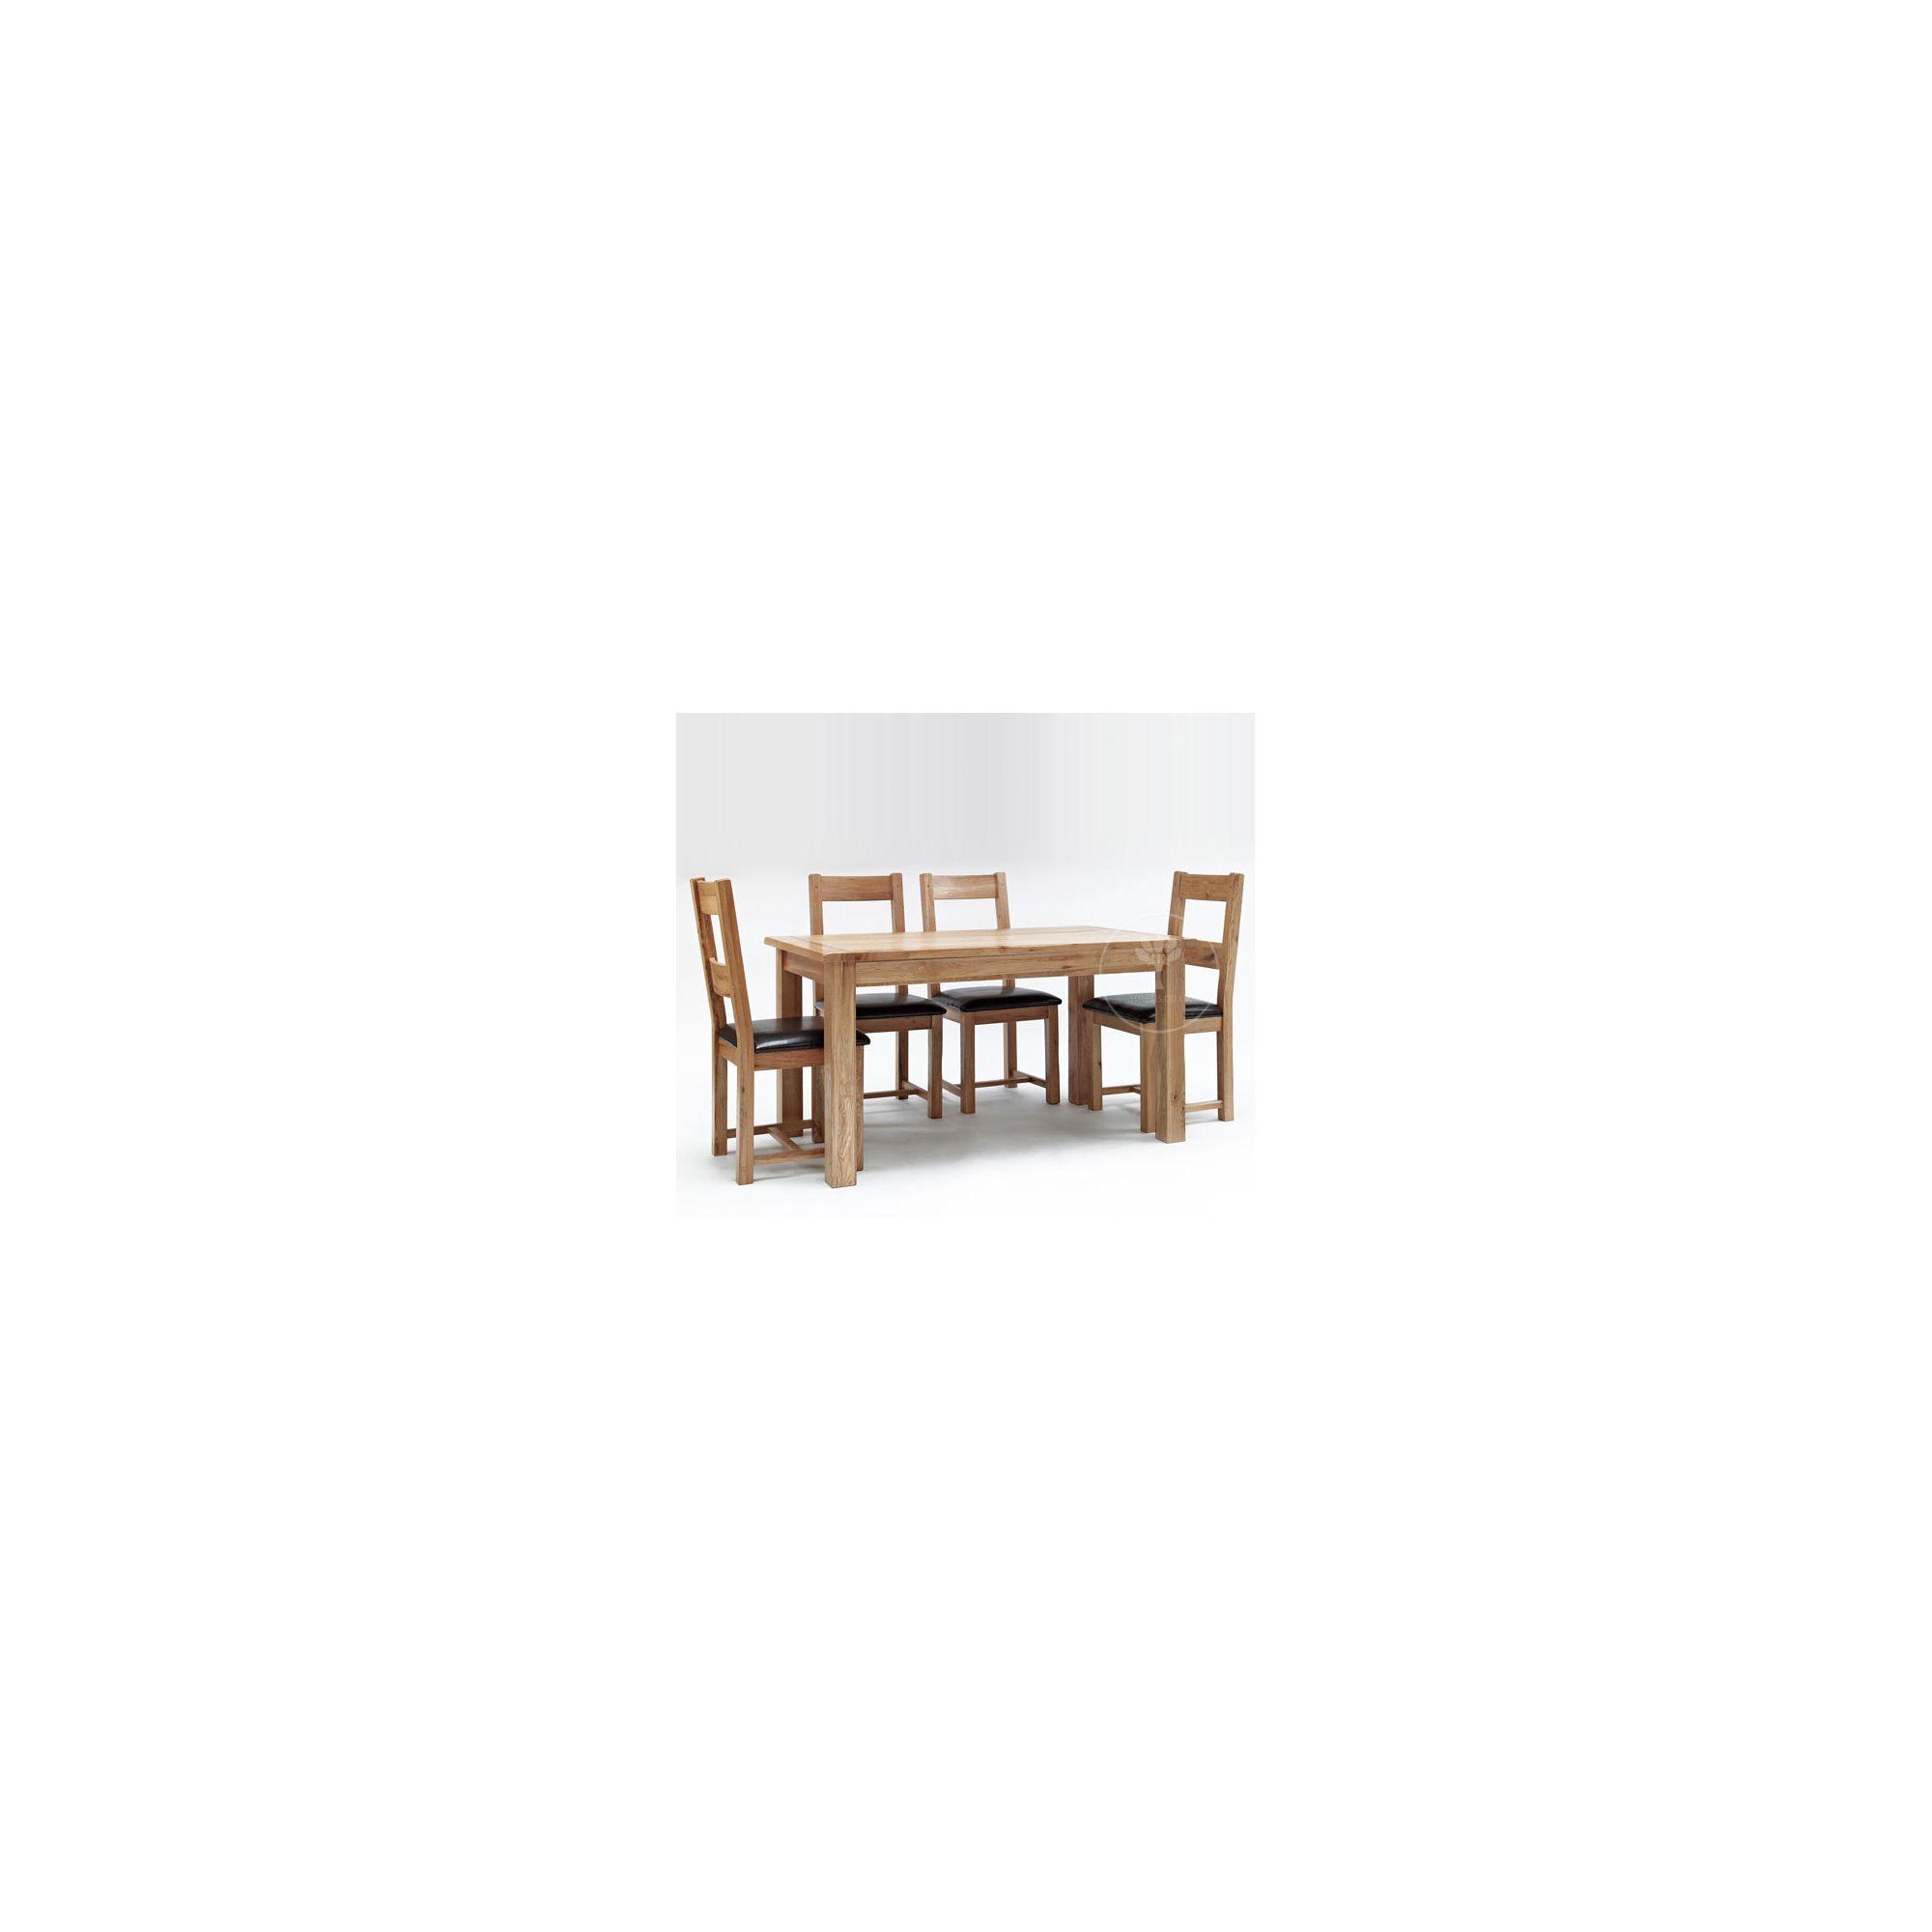 Ametis Westbury Reclaimed Oak 5 Piece Leather Dining Set at Tesco Direct